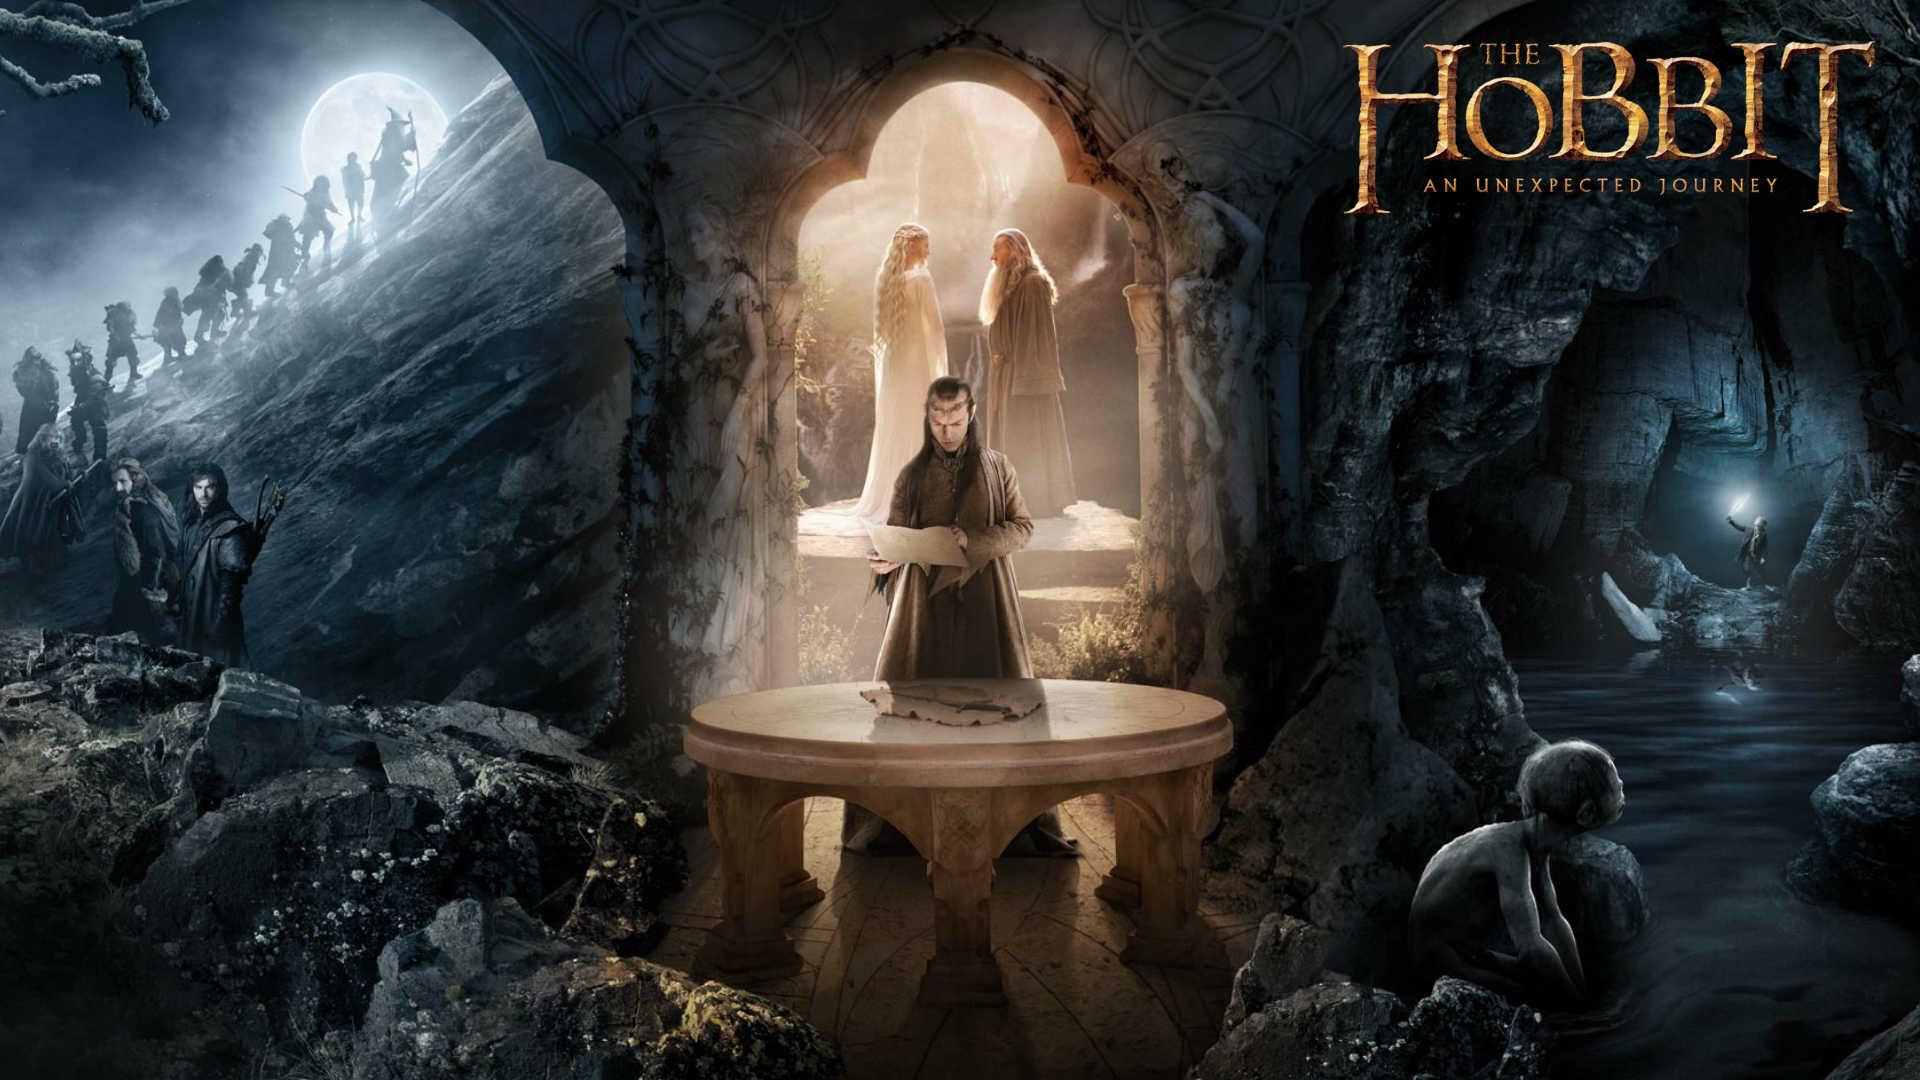 Hobbit Part 1 - An Unexpected Journey 5